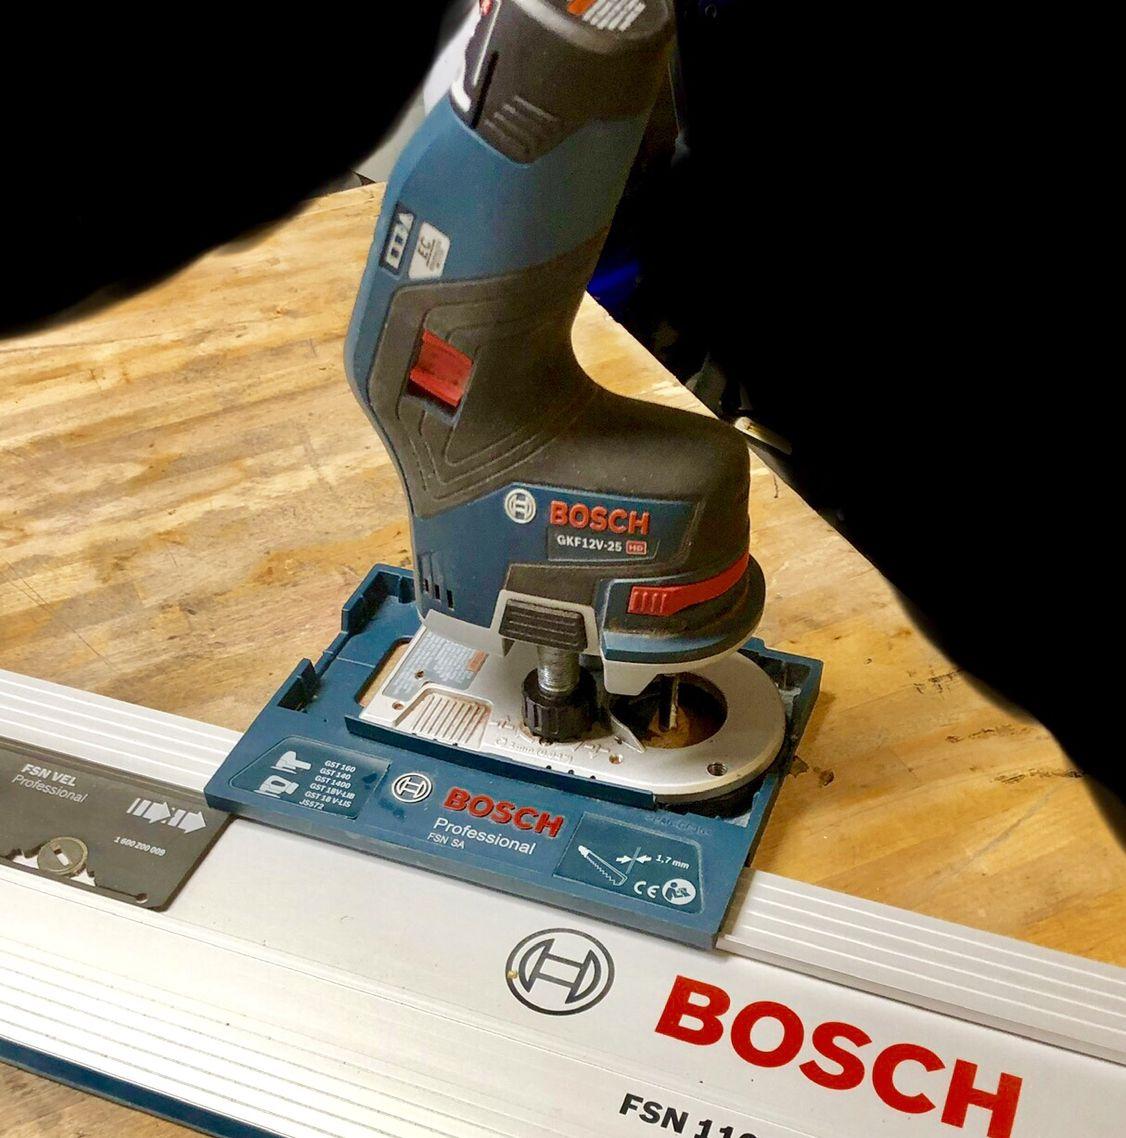 Bosch Gkf 12v 25 Meets Fsn Guide Rail Ferramentas E Equipamentos Bosch Ferramentas Ferramentas